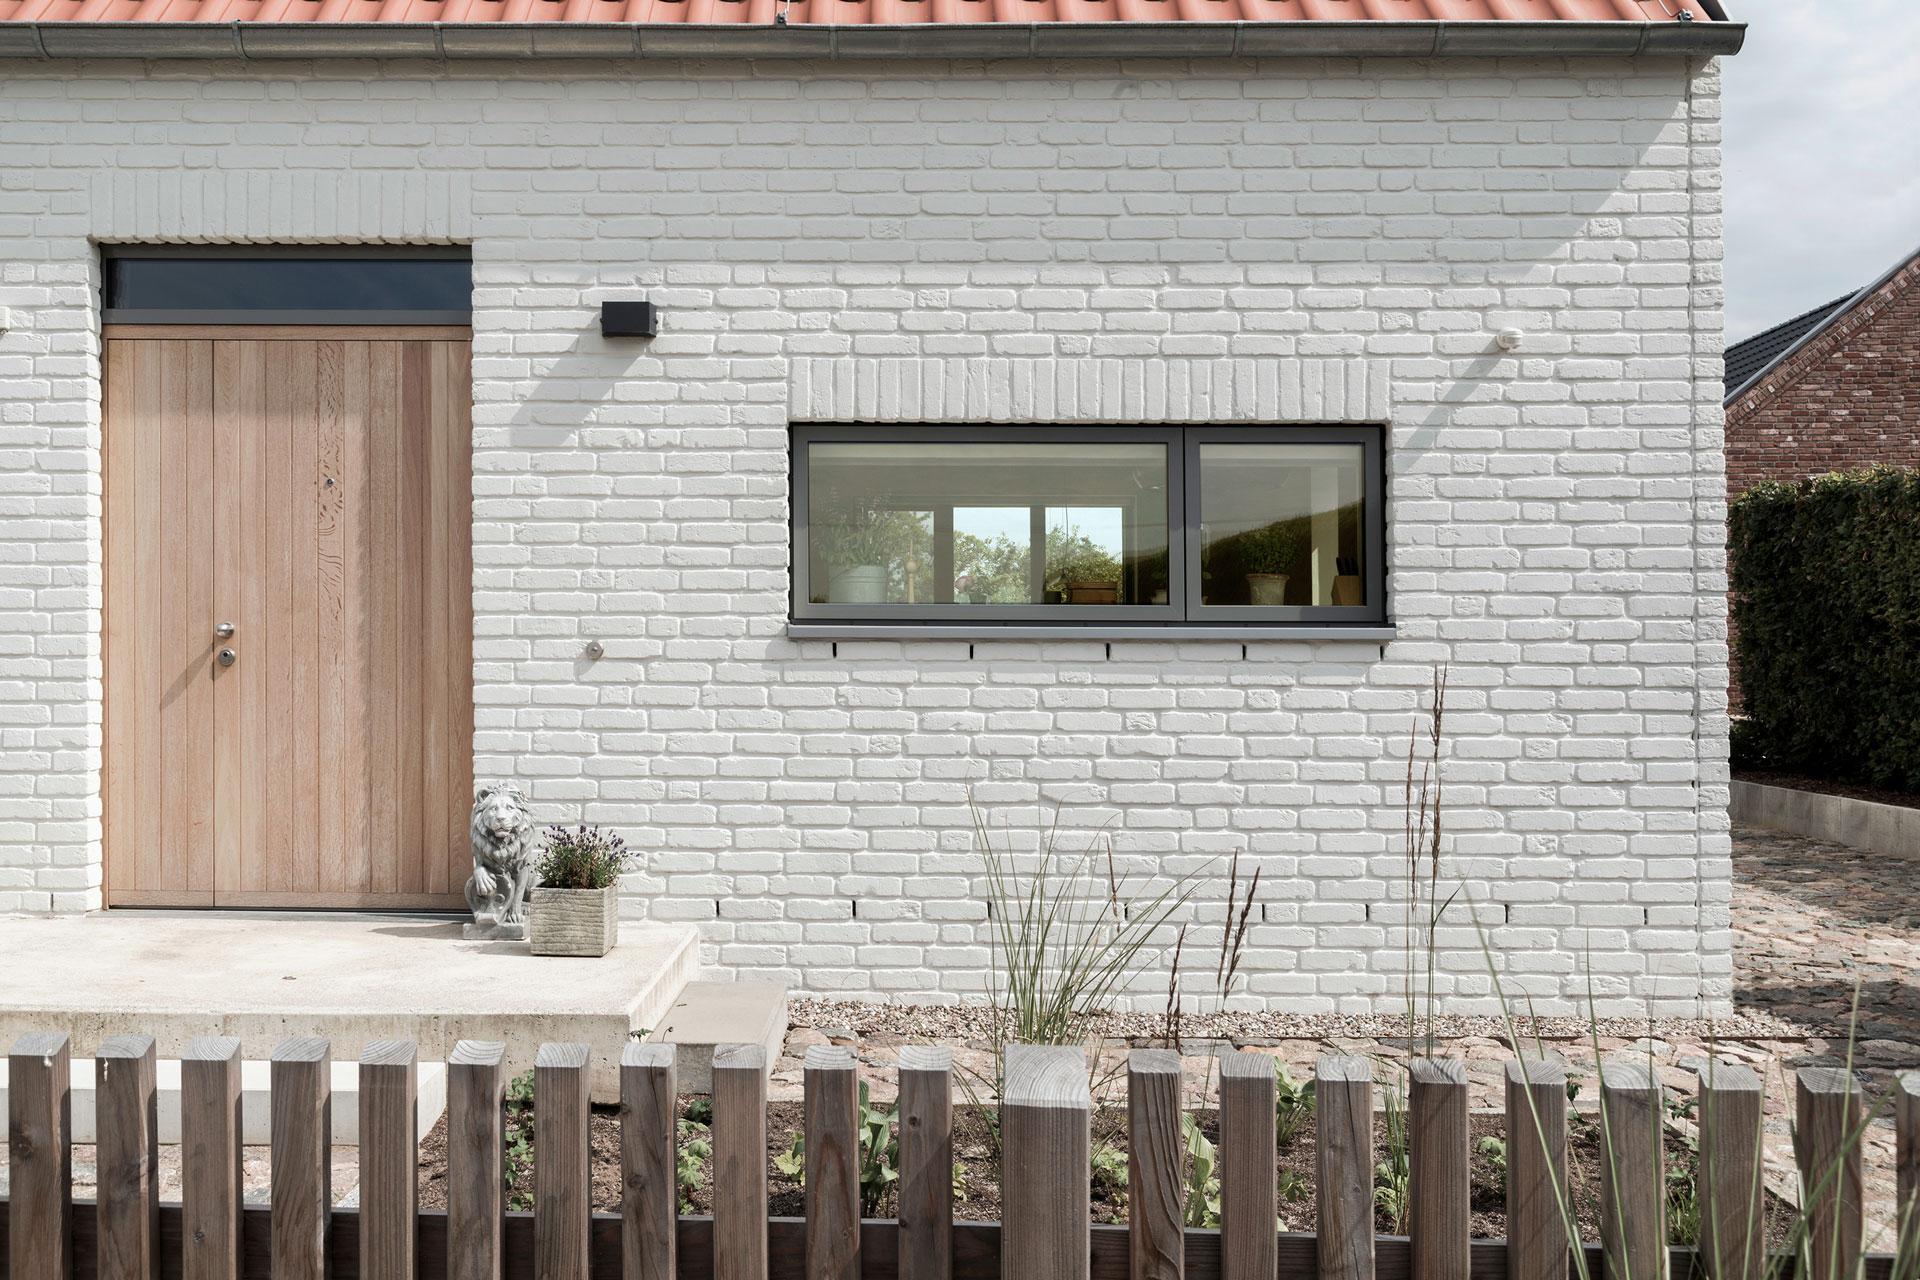 Terrasse im Landkreis NWM (03) / Totale